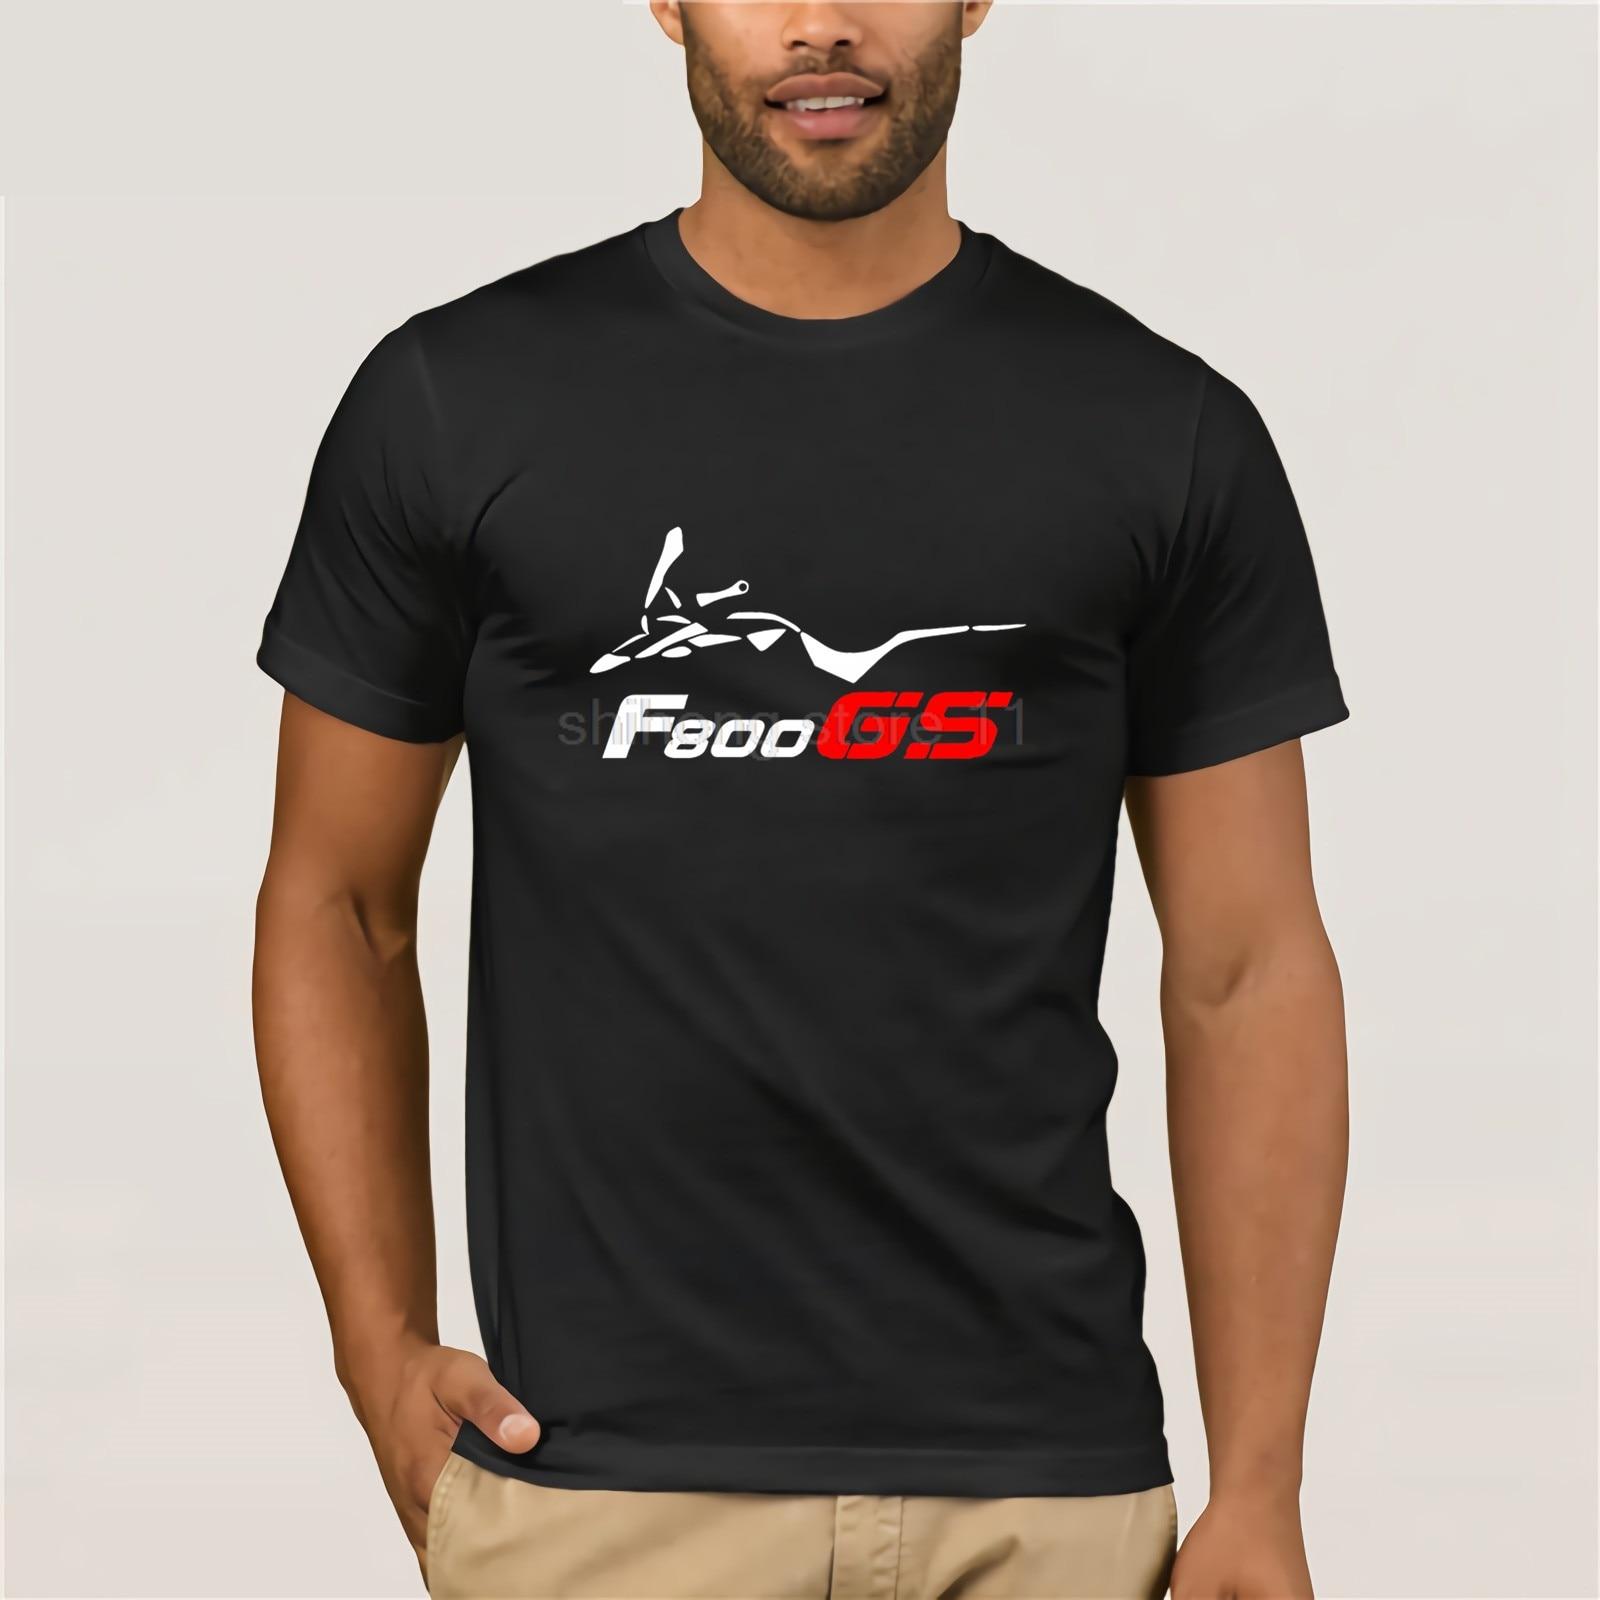 F 800 Gs Motard en Flex-motero 2020 moda para hombres, ropa de calle divertida, marca de diseño de ropa, camiseta en línea